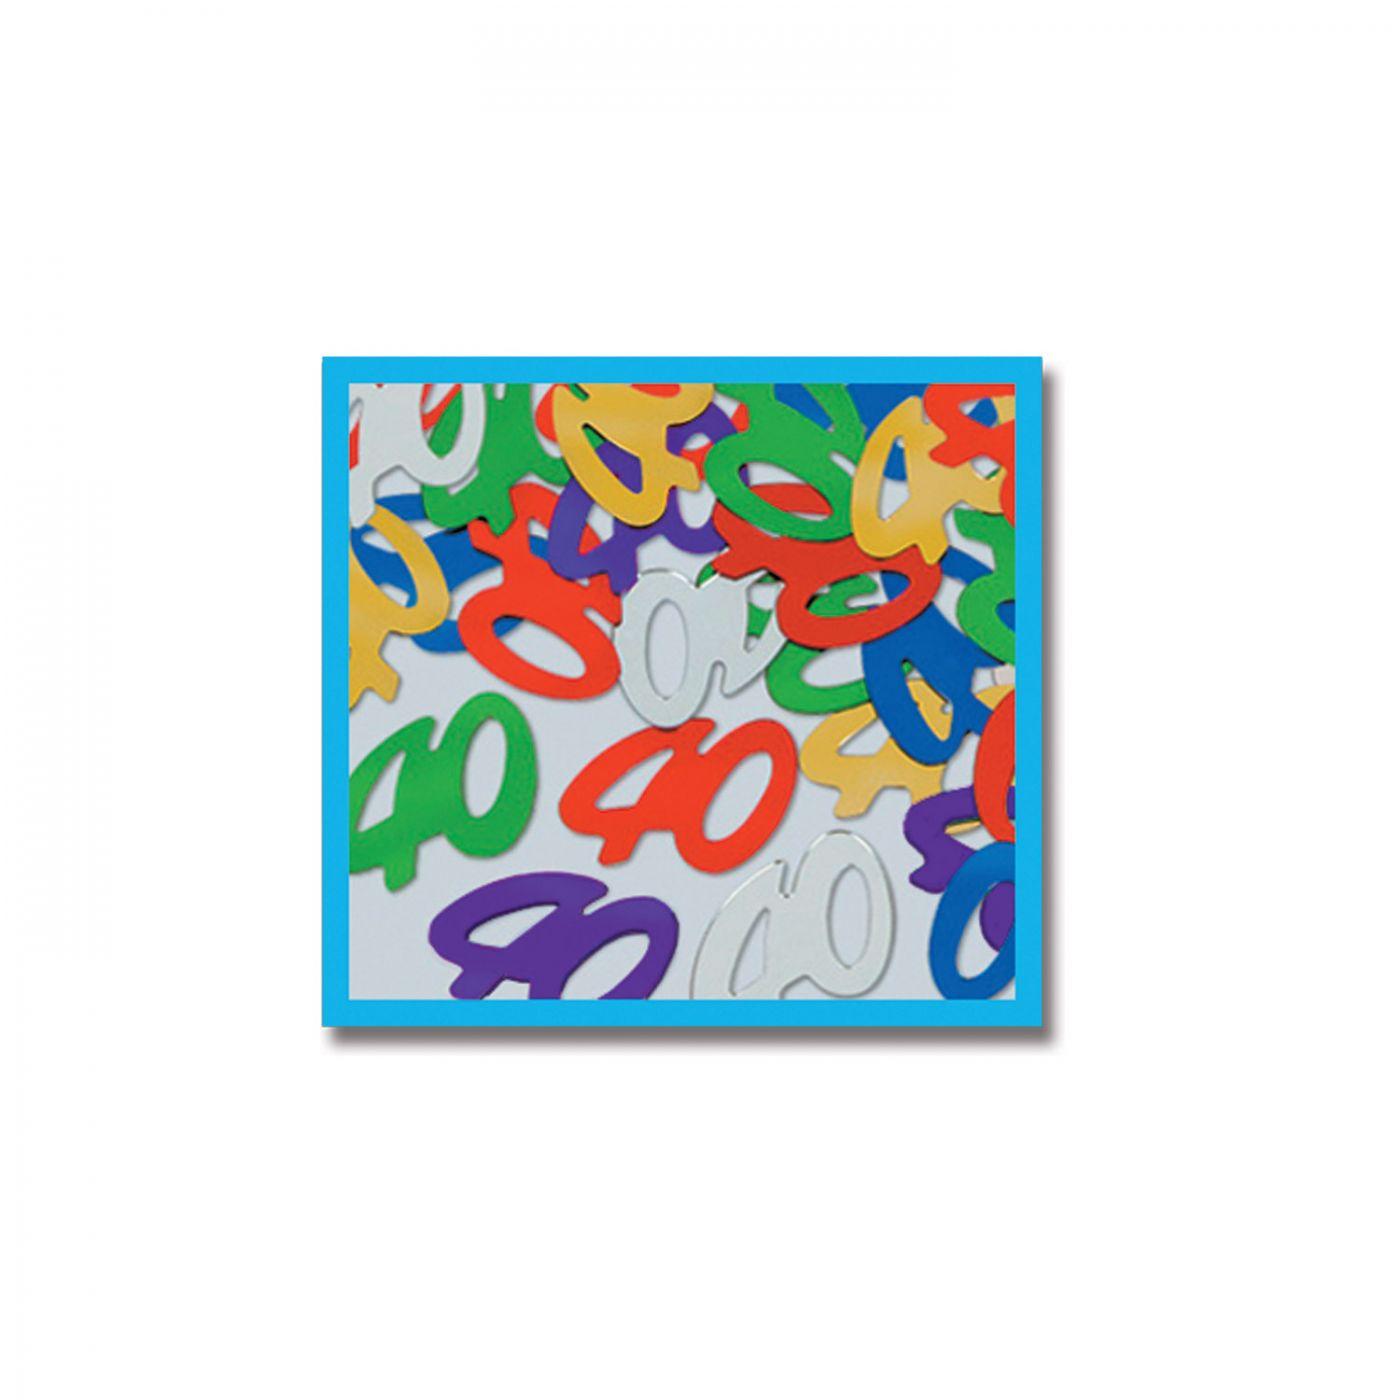 Fanci-Fetti  40  Silhouettes image